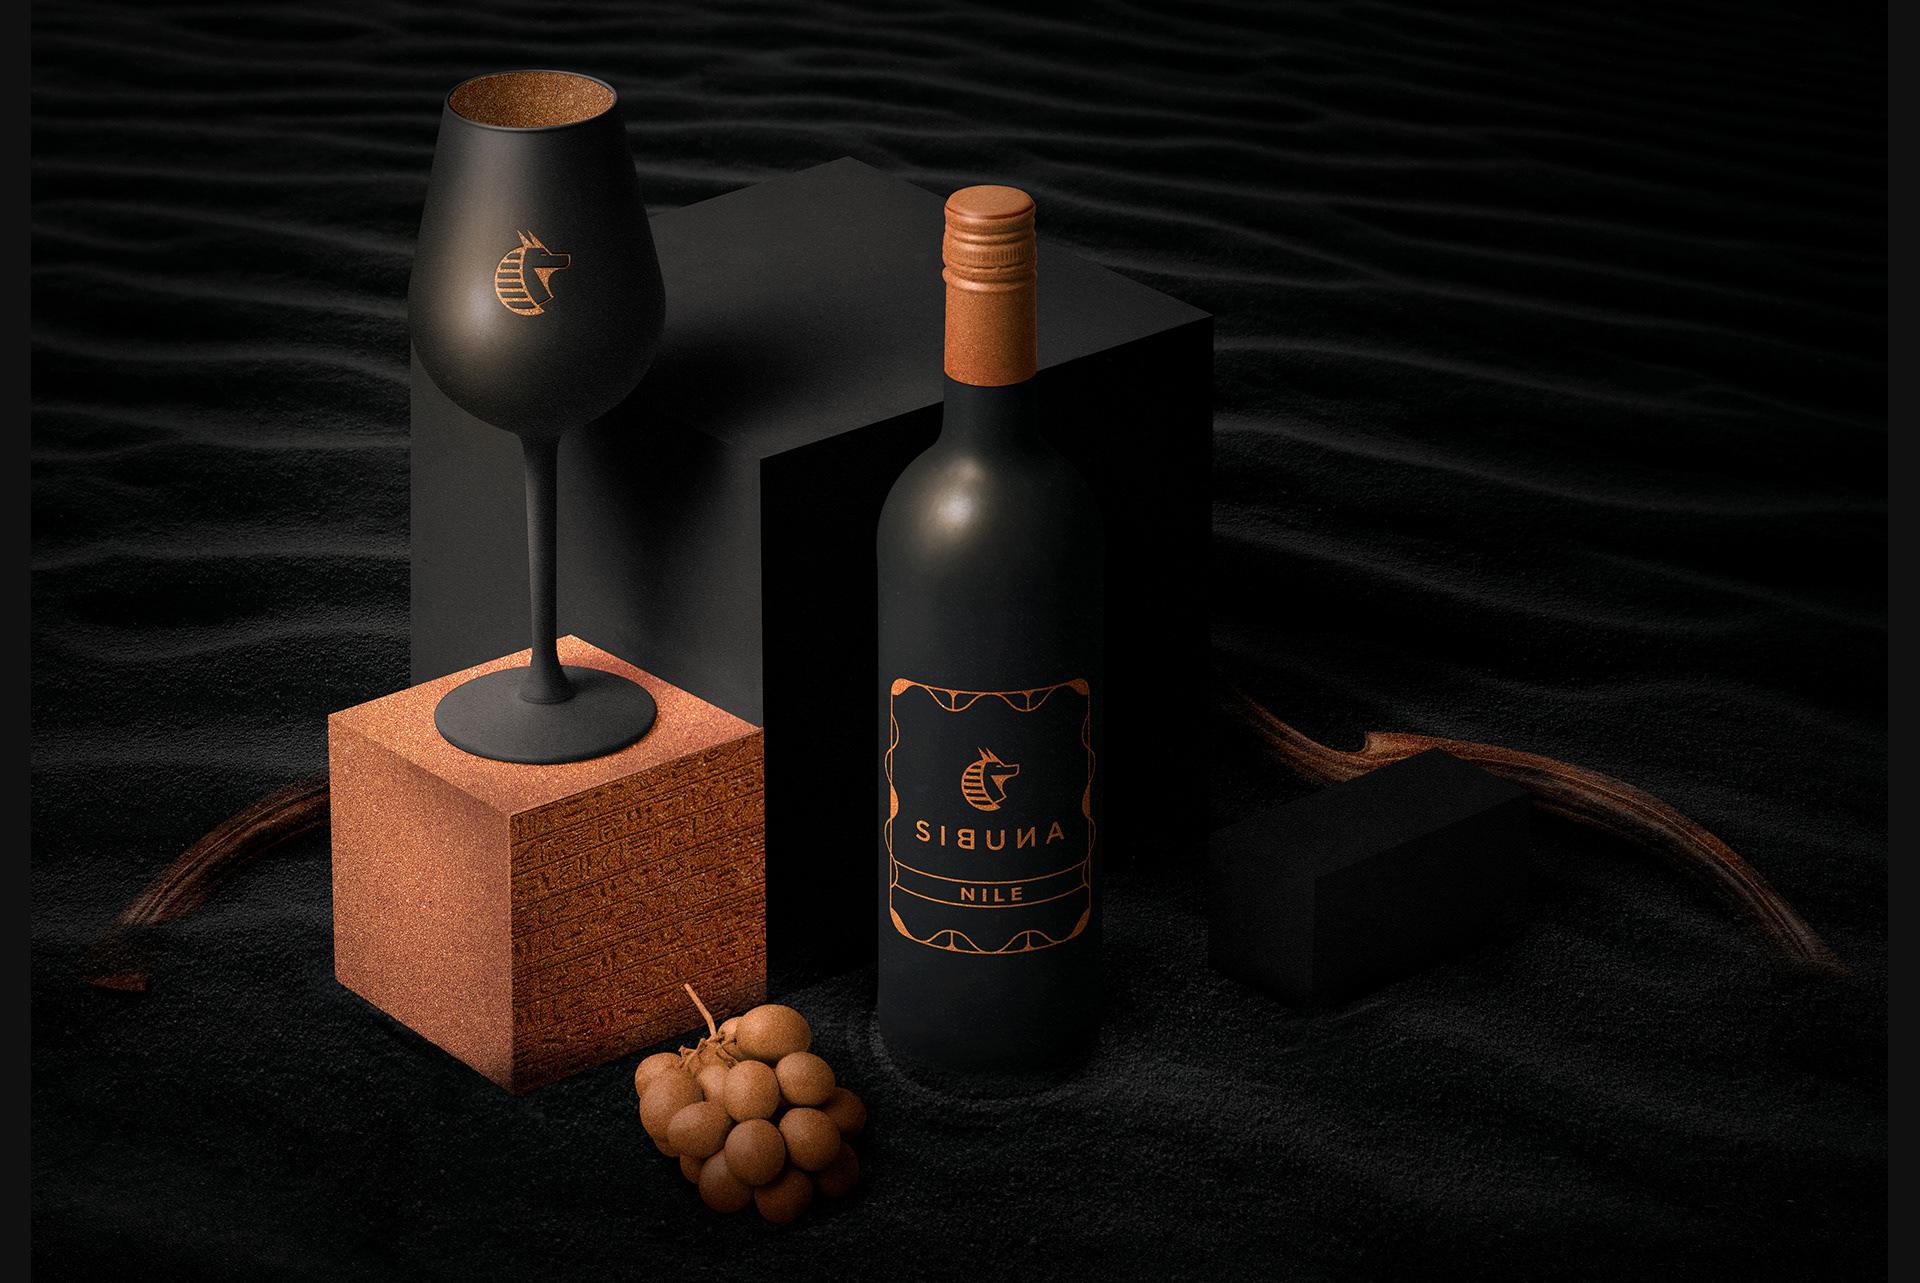 Luiz Arthuso Design Studio - Sibuna - Winery14.jpg